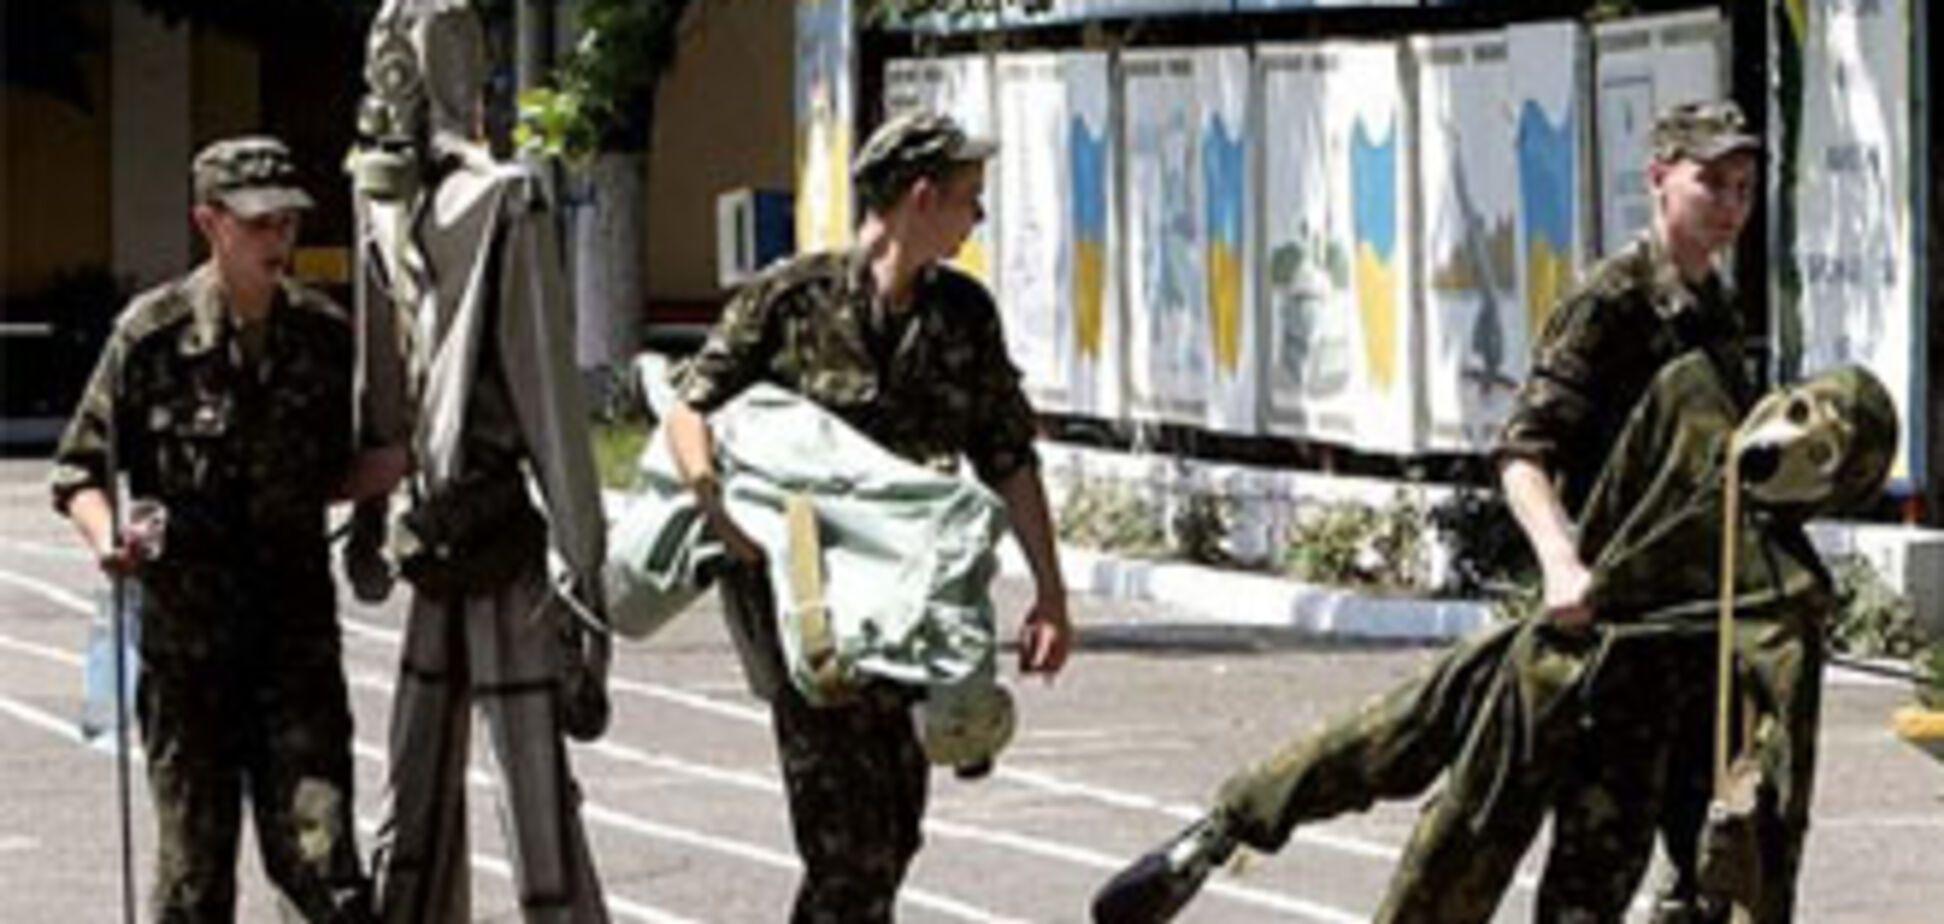 Гриценко: українська армія на межі катастрофи